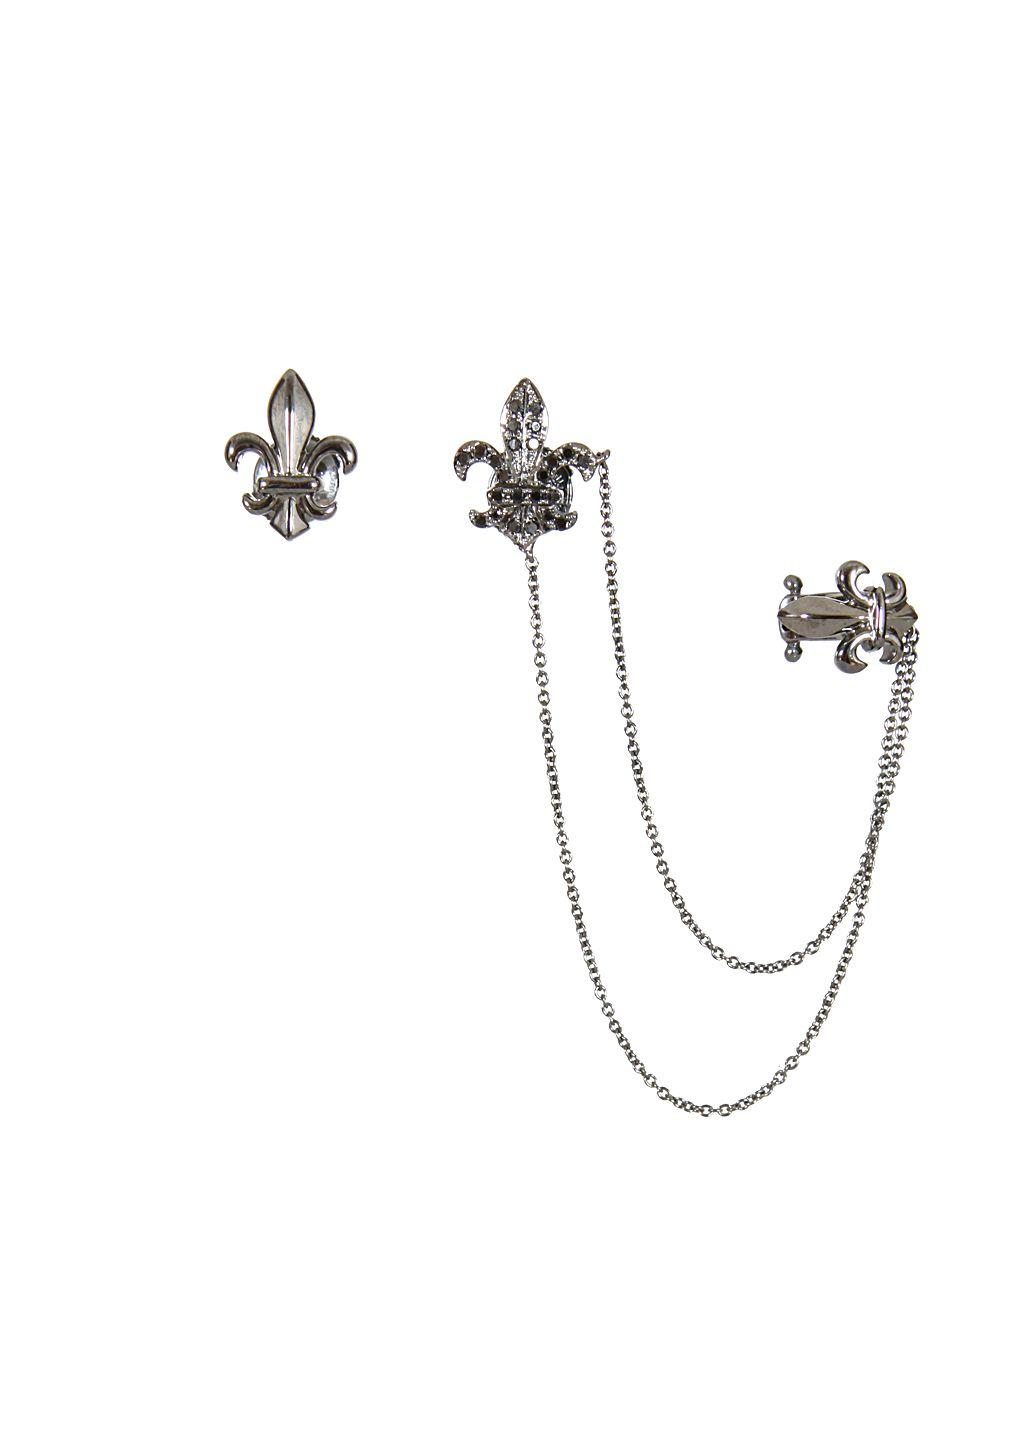 Elise Dray Earrings :: Elise Dray black gold and black diamonds lys flower Rock & Chain earrings | Montaigne Market